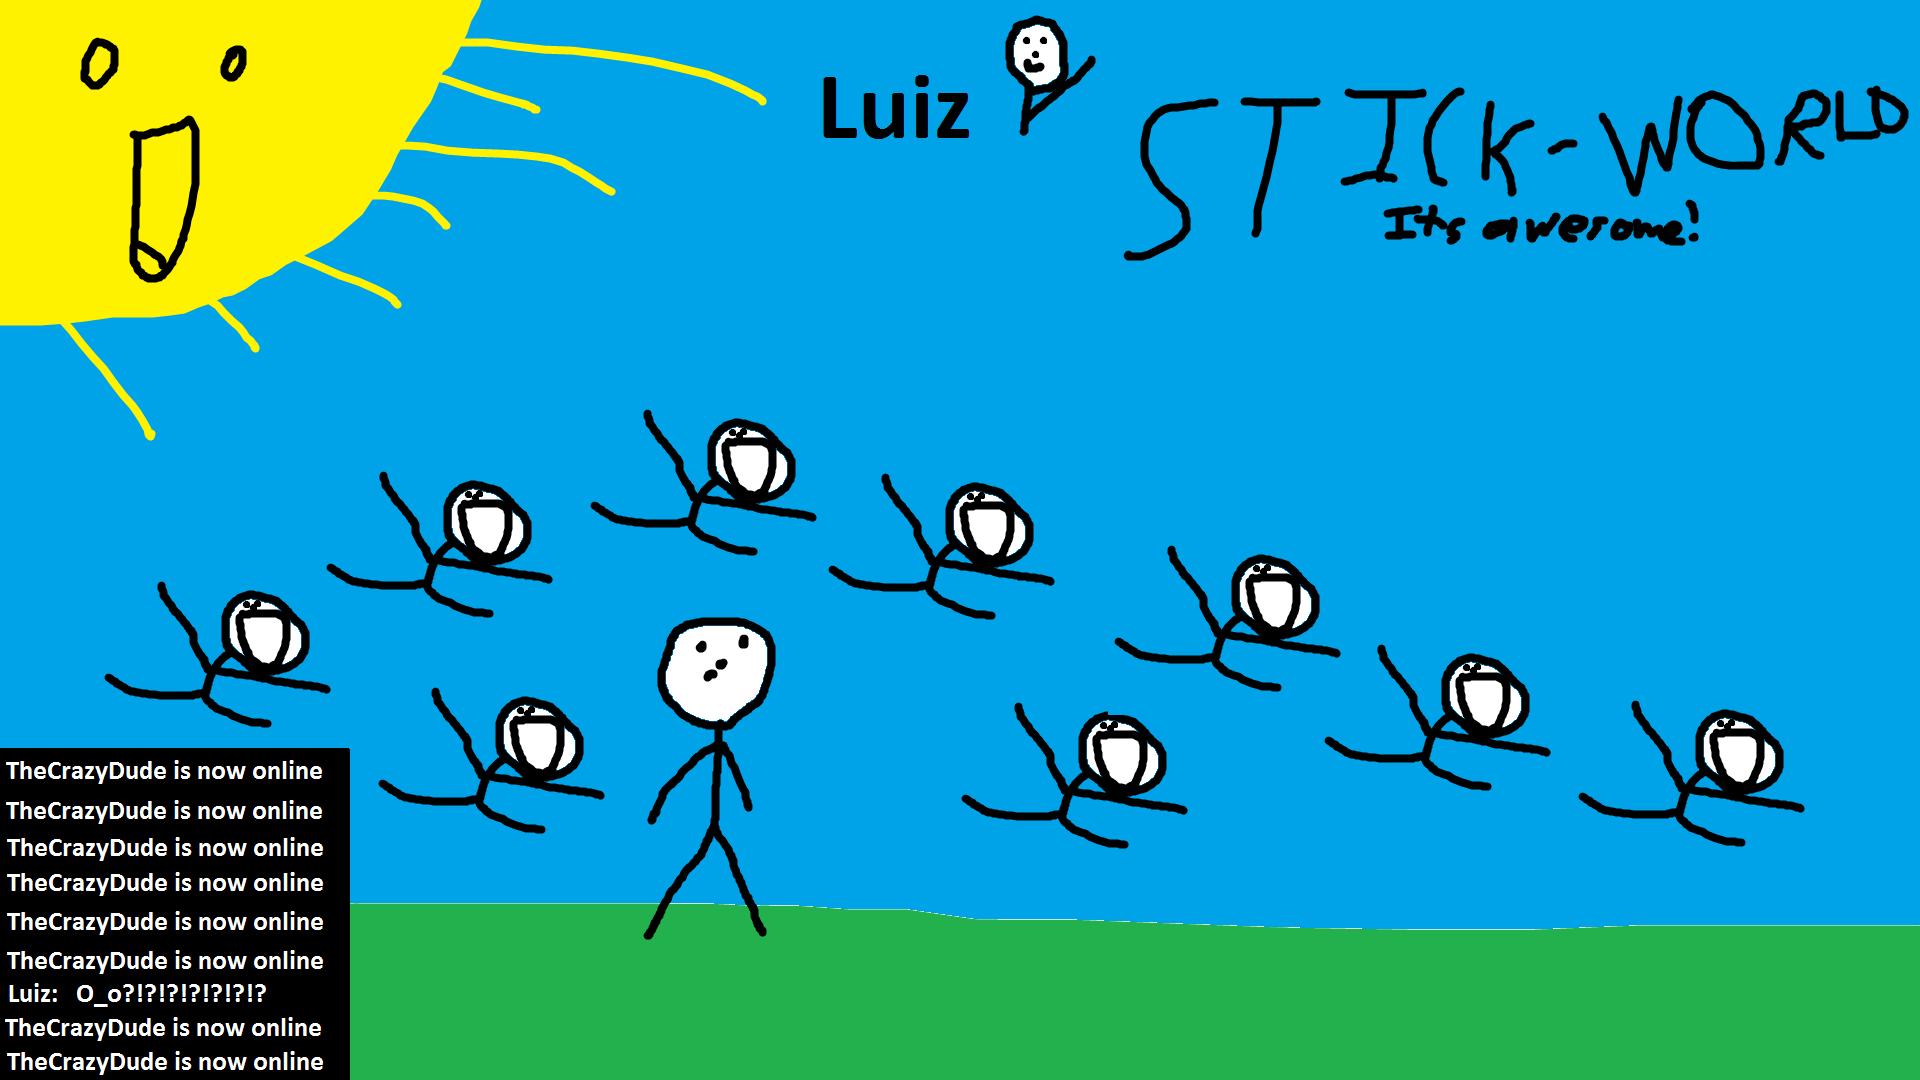 Stick World 1#